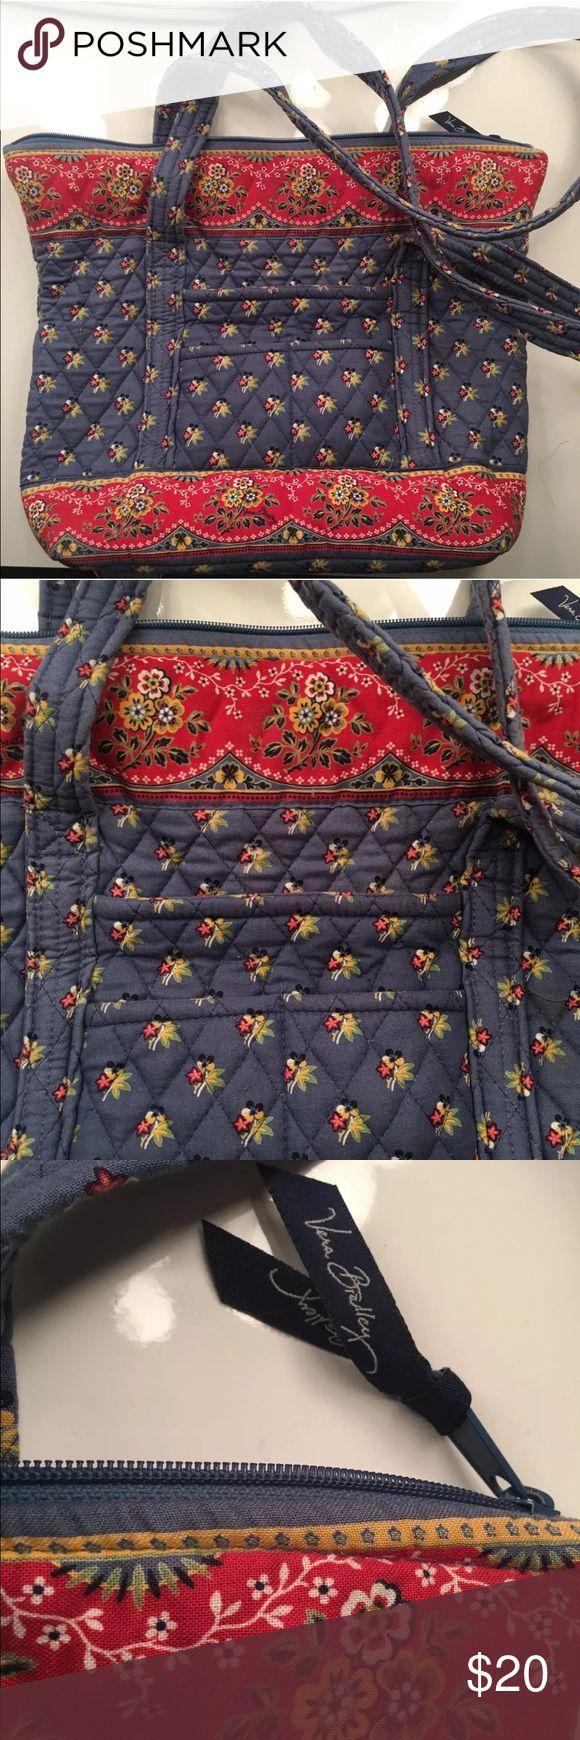 Vera Bradley Tote Bag Vera Bradley tote shoulder bag. Size 15'x12'x5'. Great condition. Vera Bradley Bags Totes